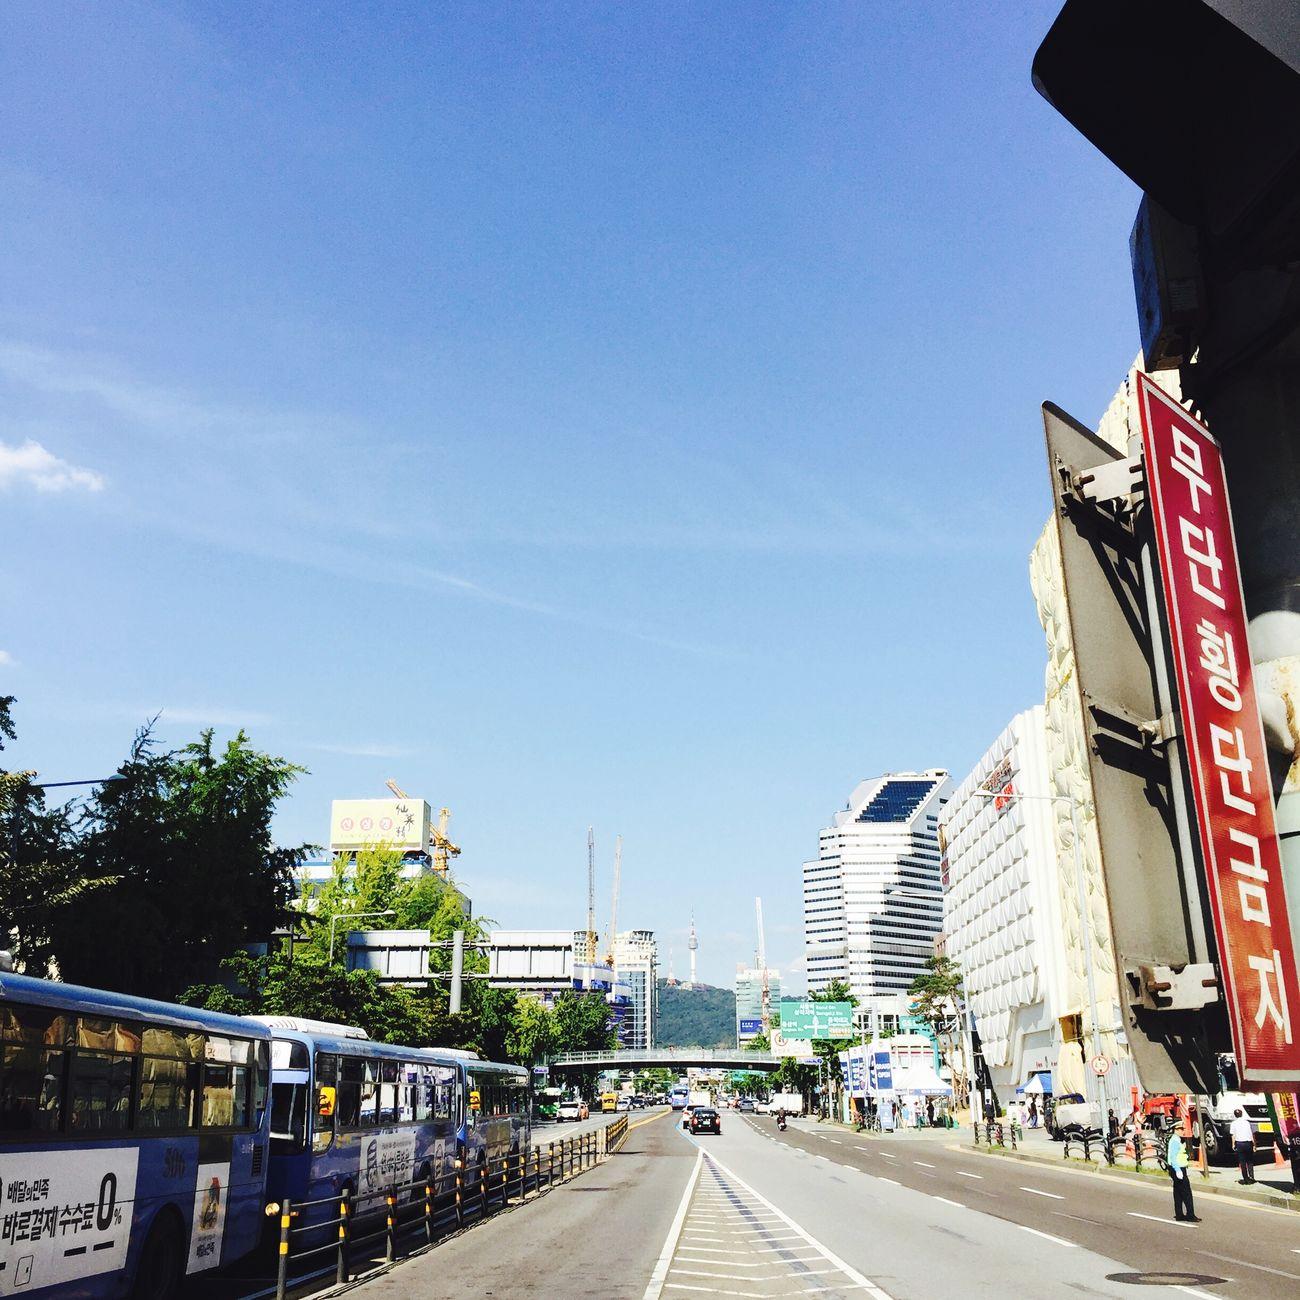 Namsan Tower  가 슬쩍 보인다. Street Photography